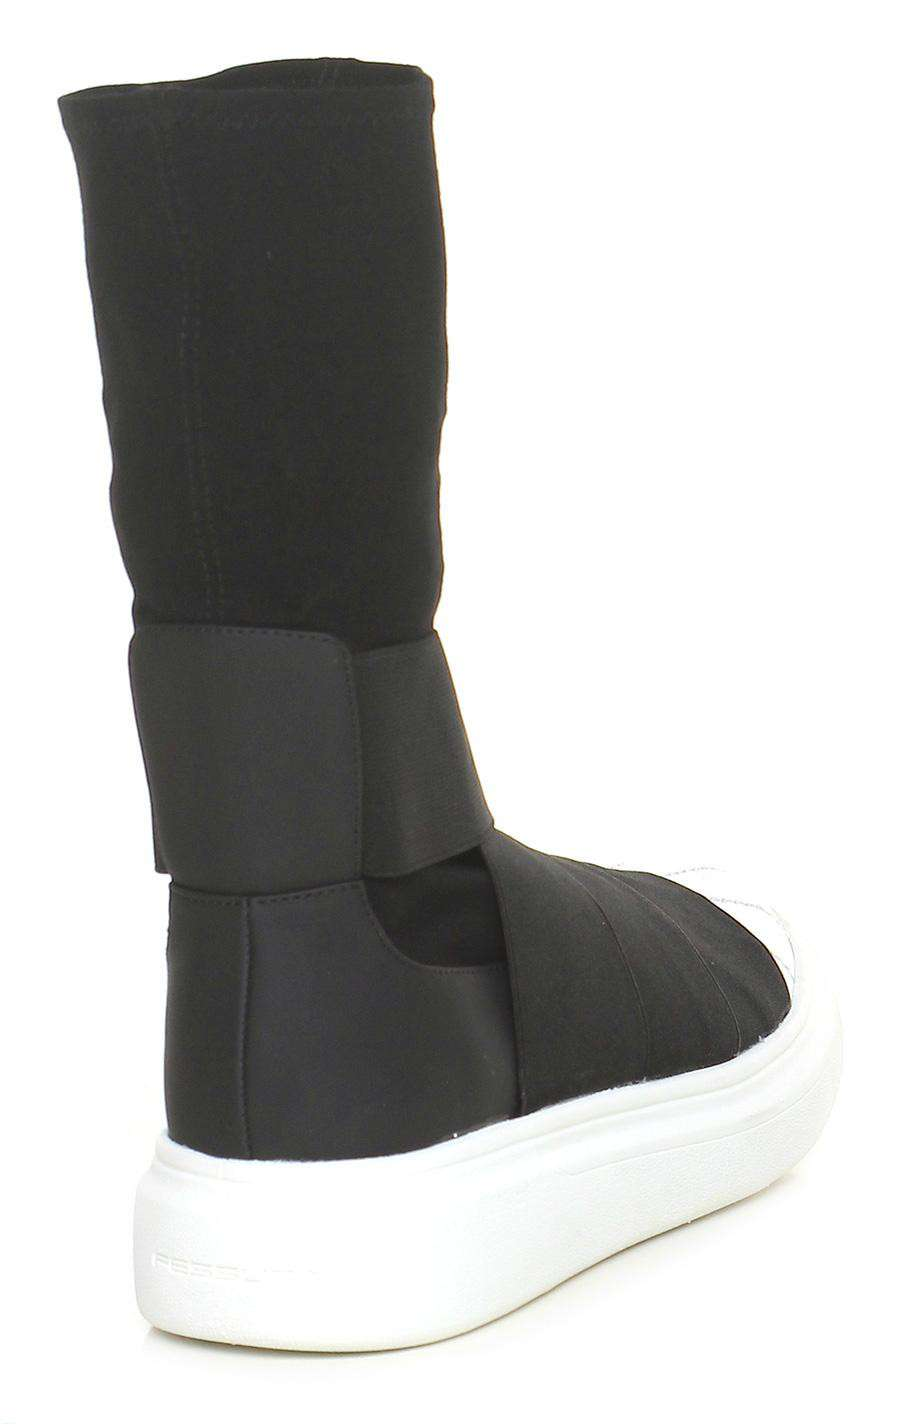 https://www.parmax.com/media/catalog/product/A/I/AI-outlet_parmax-scarpa-bambina-Fessura-EDGEGANG-D.jpg